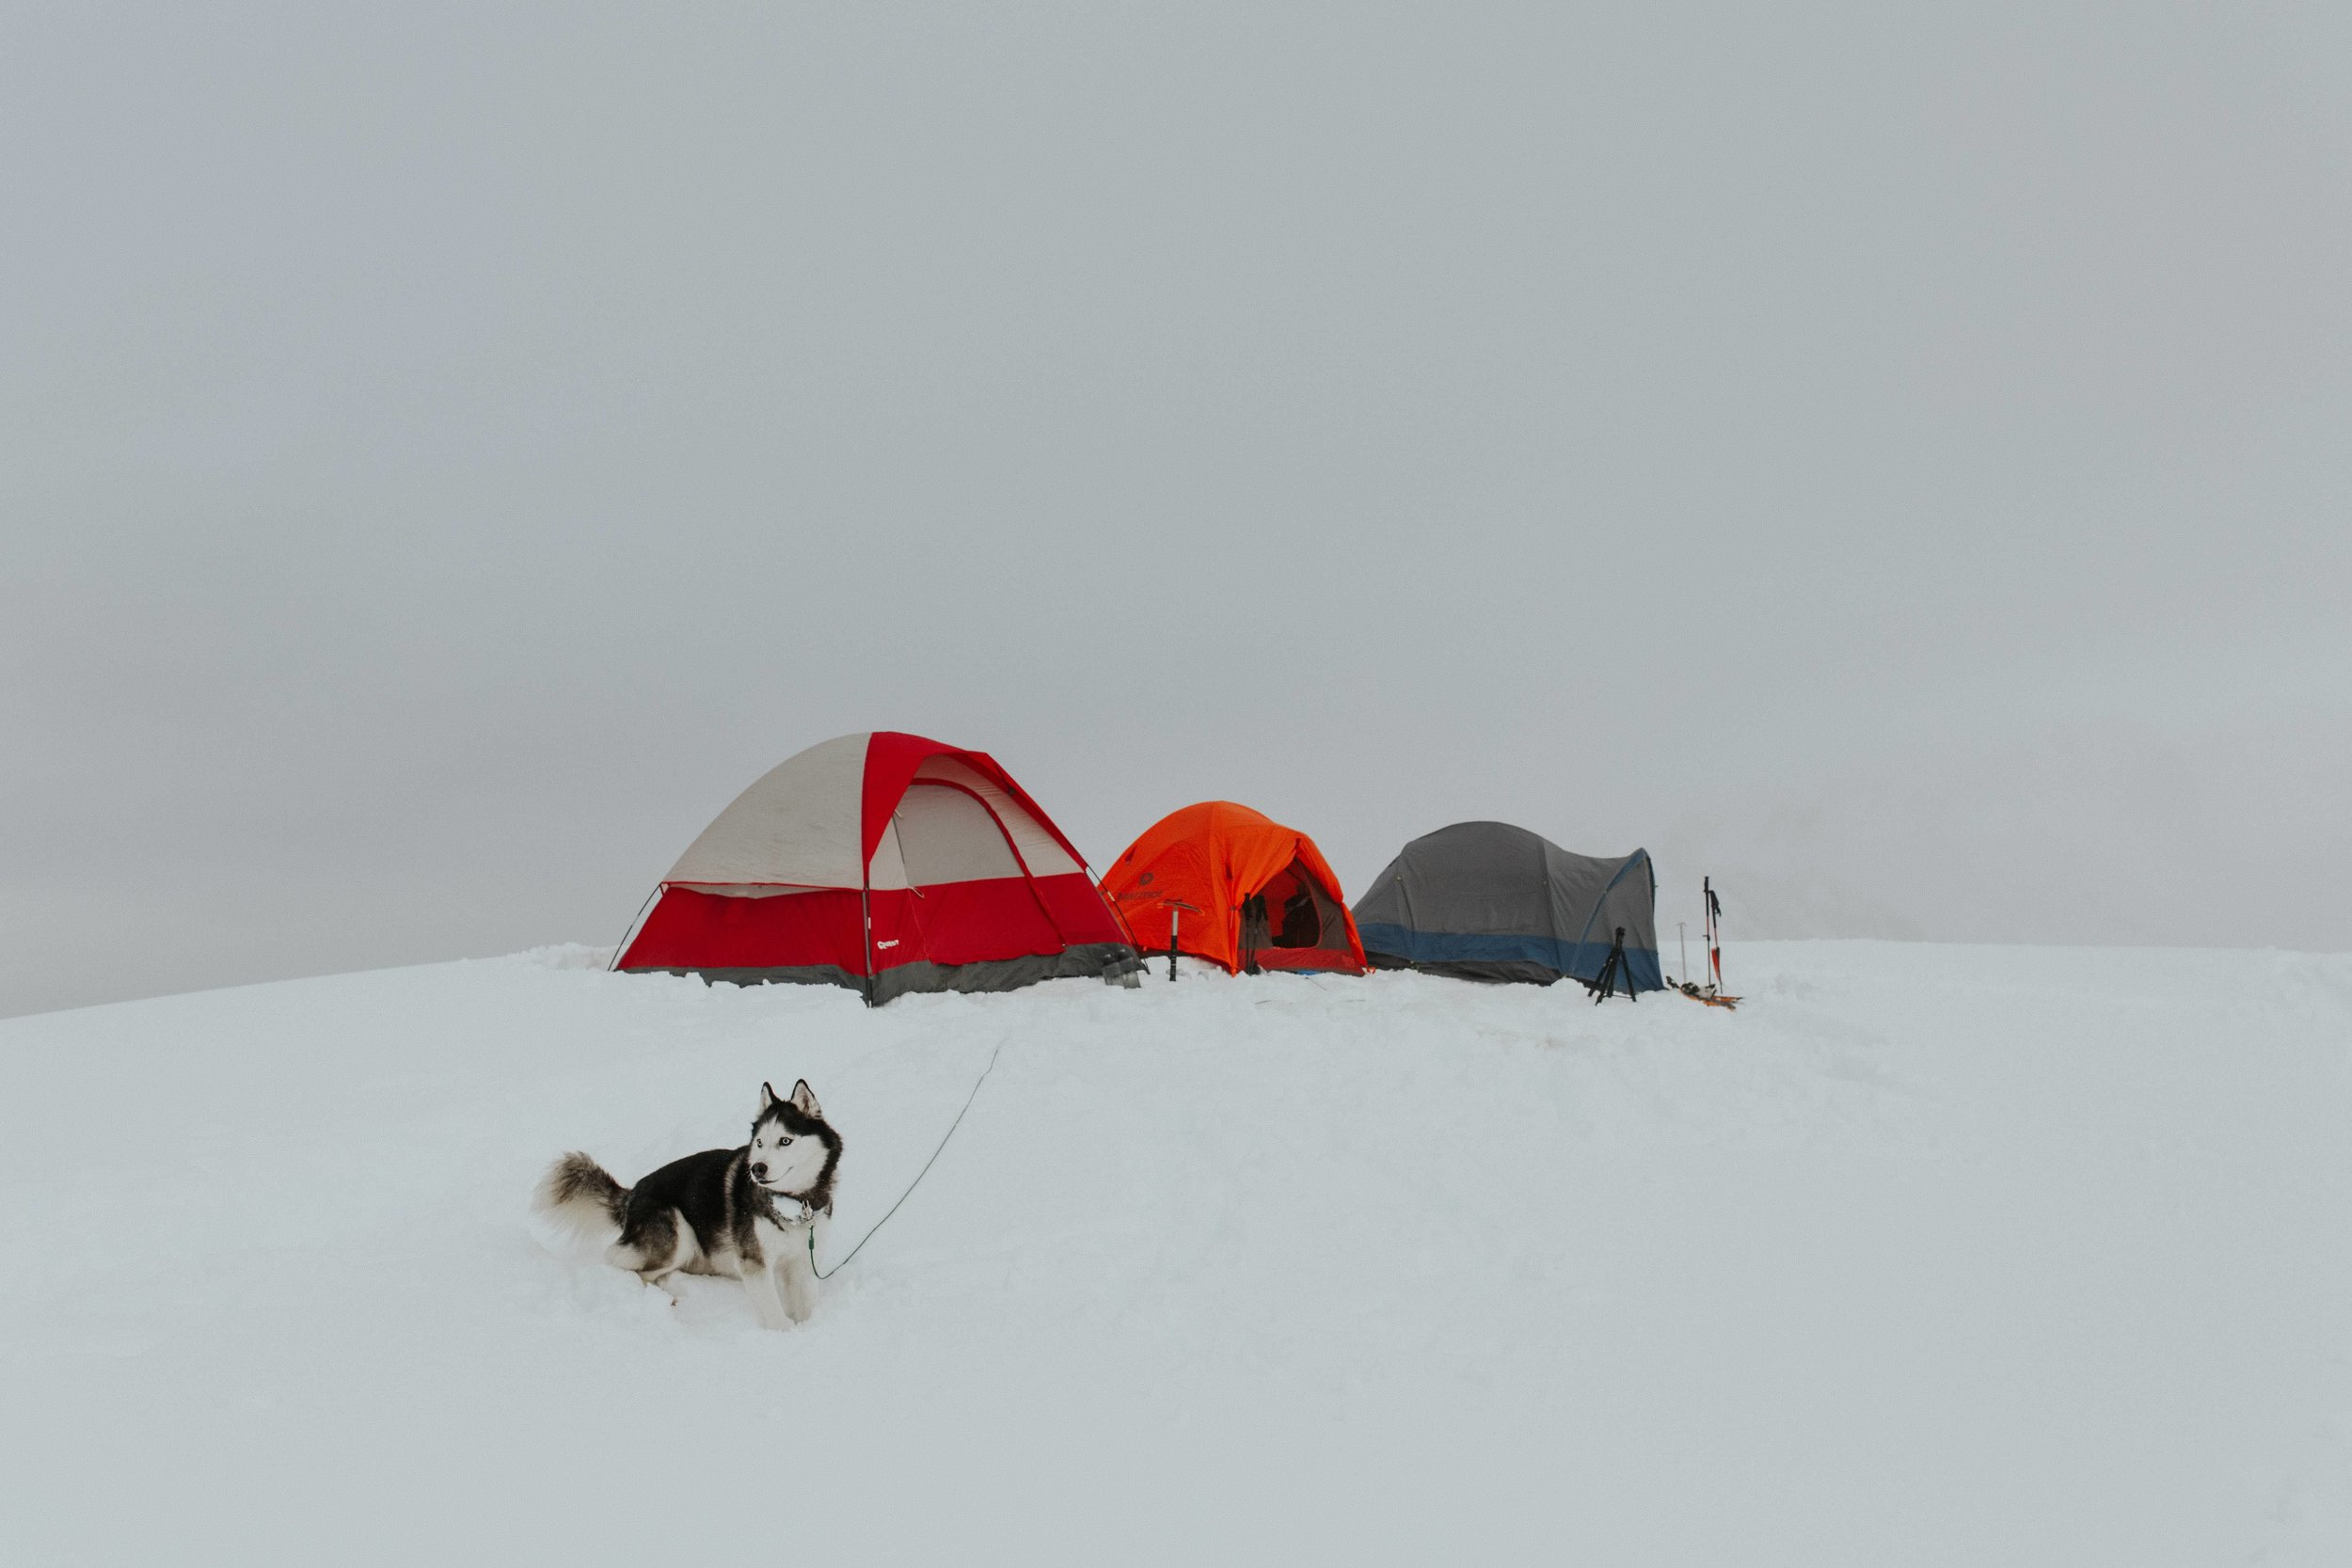 adventure-wedding-photographer-artist-point-snow-camping-elopement-photographer-husky-marmot-tent.jpg